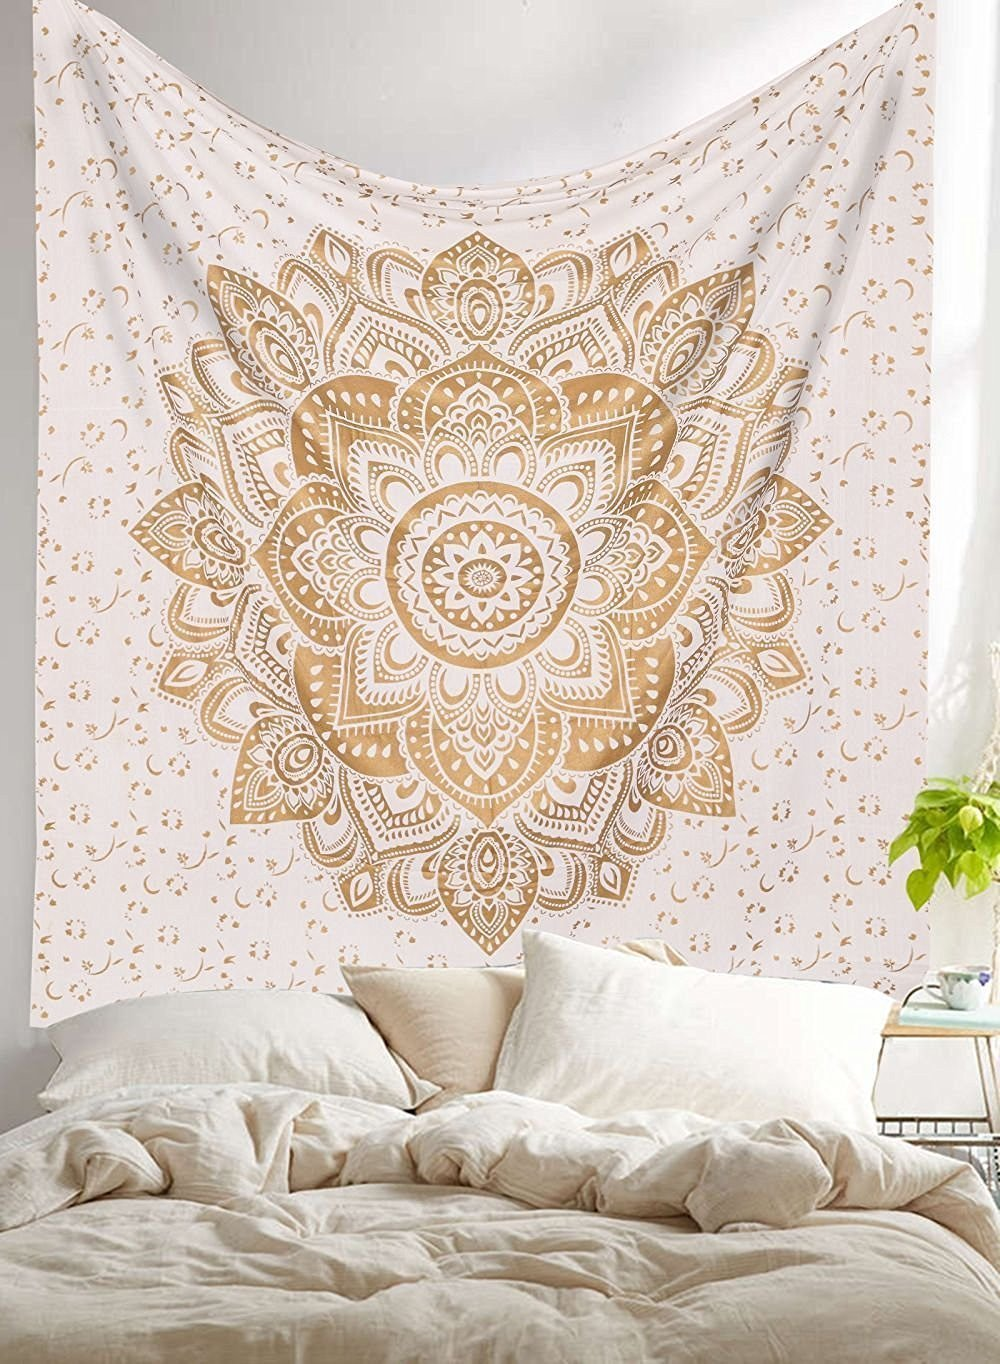 Madhu International New Launched Twin White Gold Ombre Mandala Tapestry By, Boho Mandala Tapestry, Twin Wall Hanging, Gypsy Tapestry, Mandala Wall Tapestries